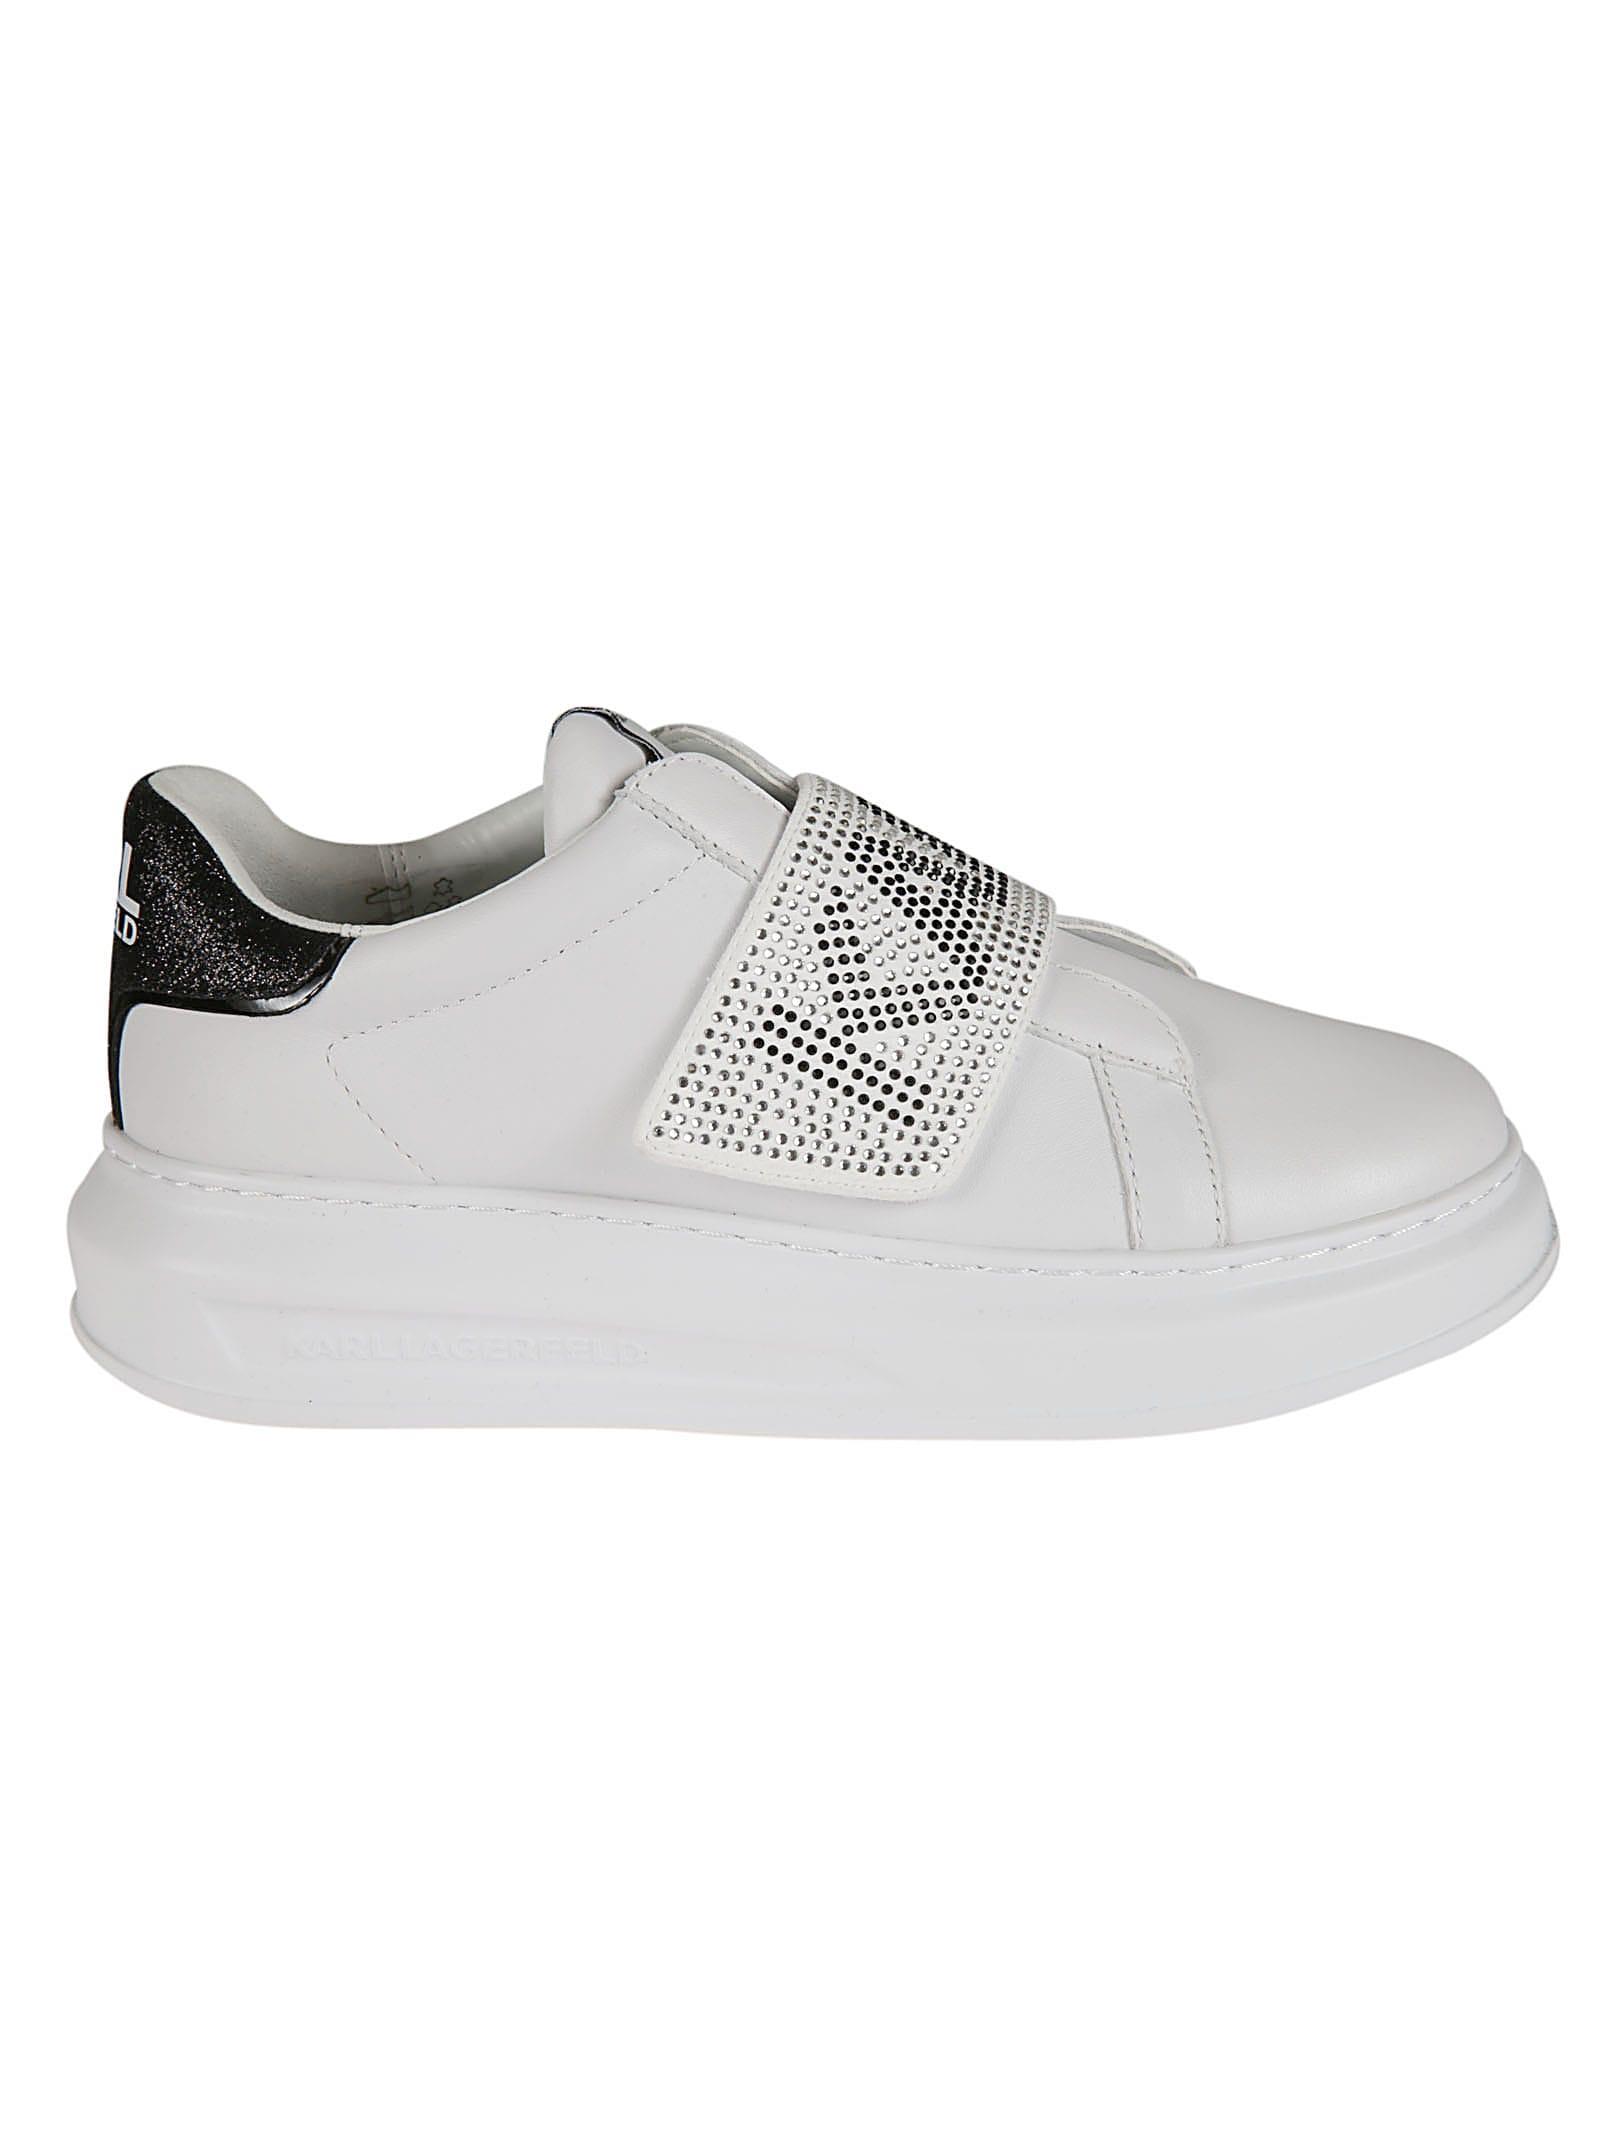 Karl Lagerfeld Glitz Logo Sneakers